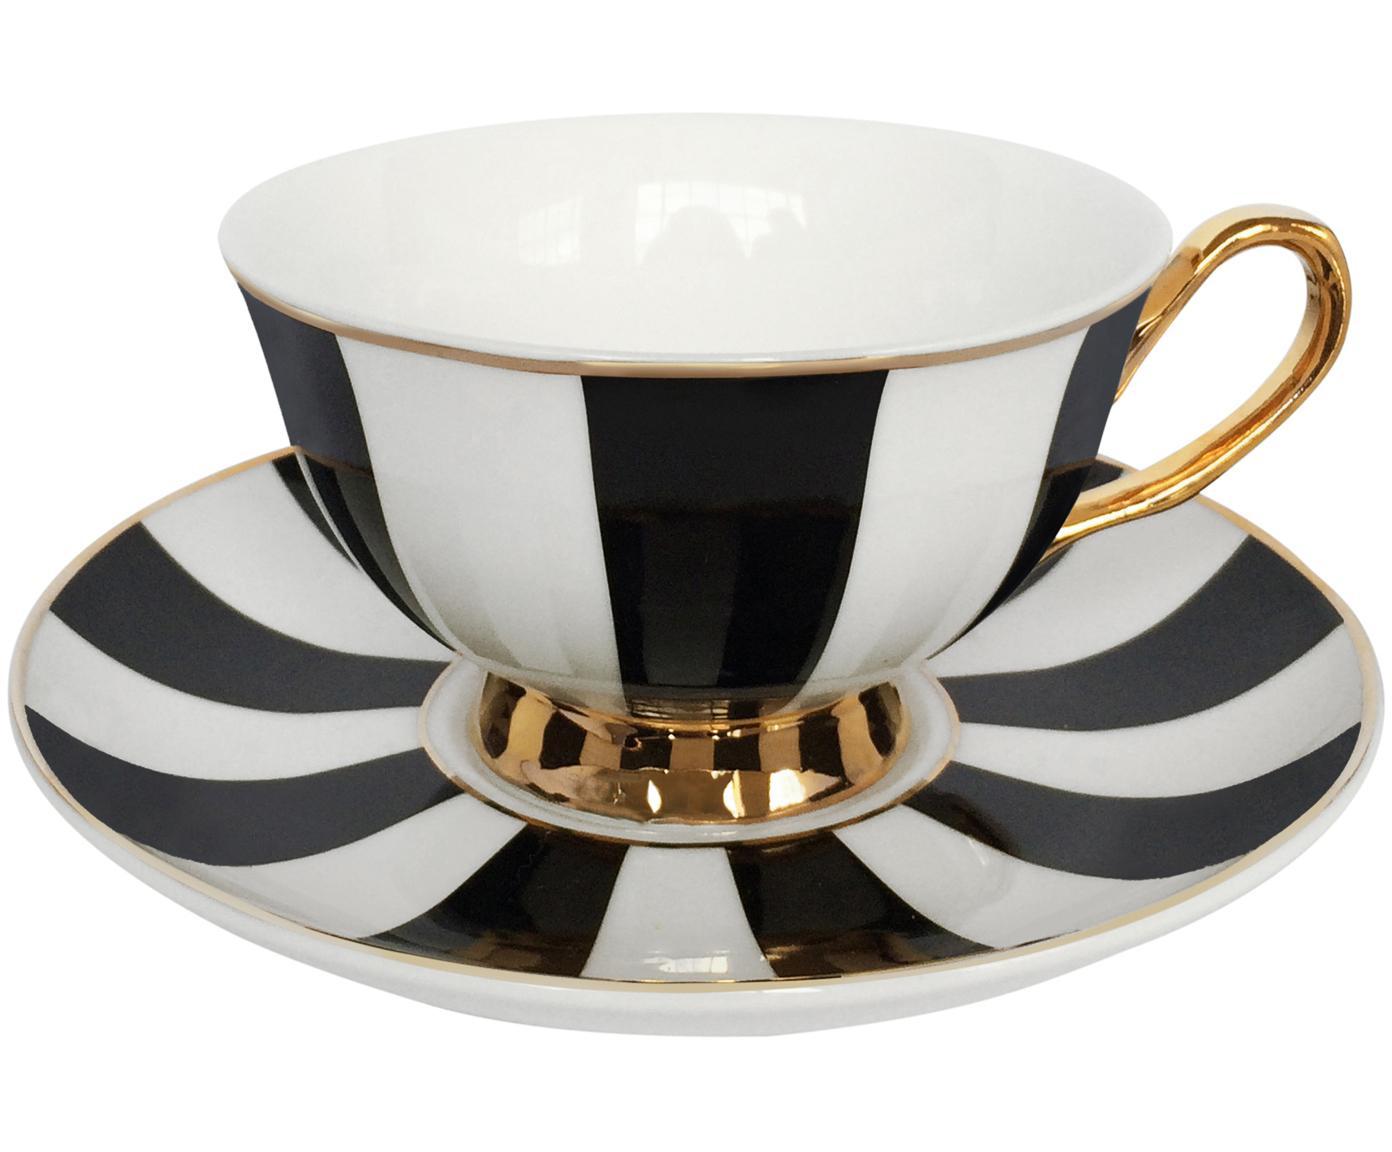 Taza de té Stripy, 2pzas., Porcelana fina, dorada, Negro, blanco Borde y asa: oro, Ø 15 x Al 6 cm